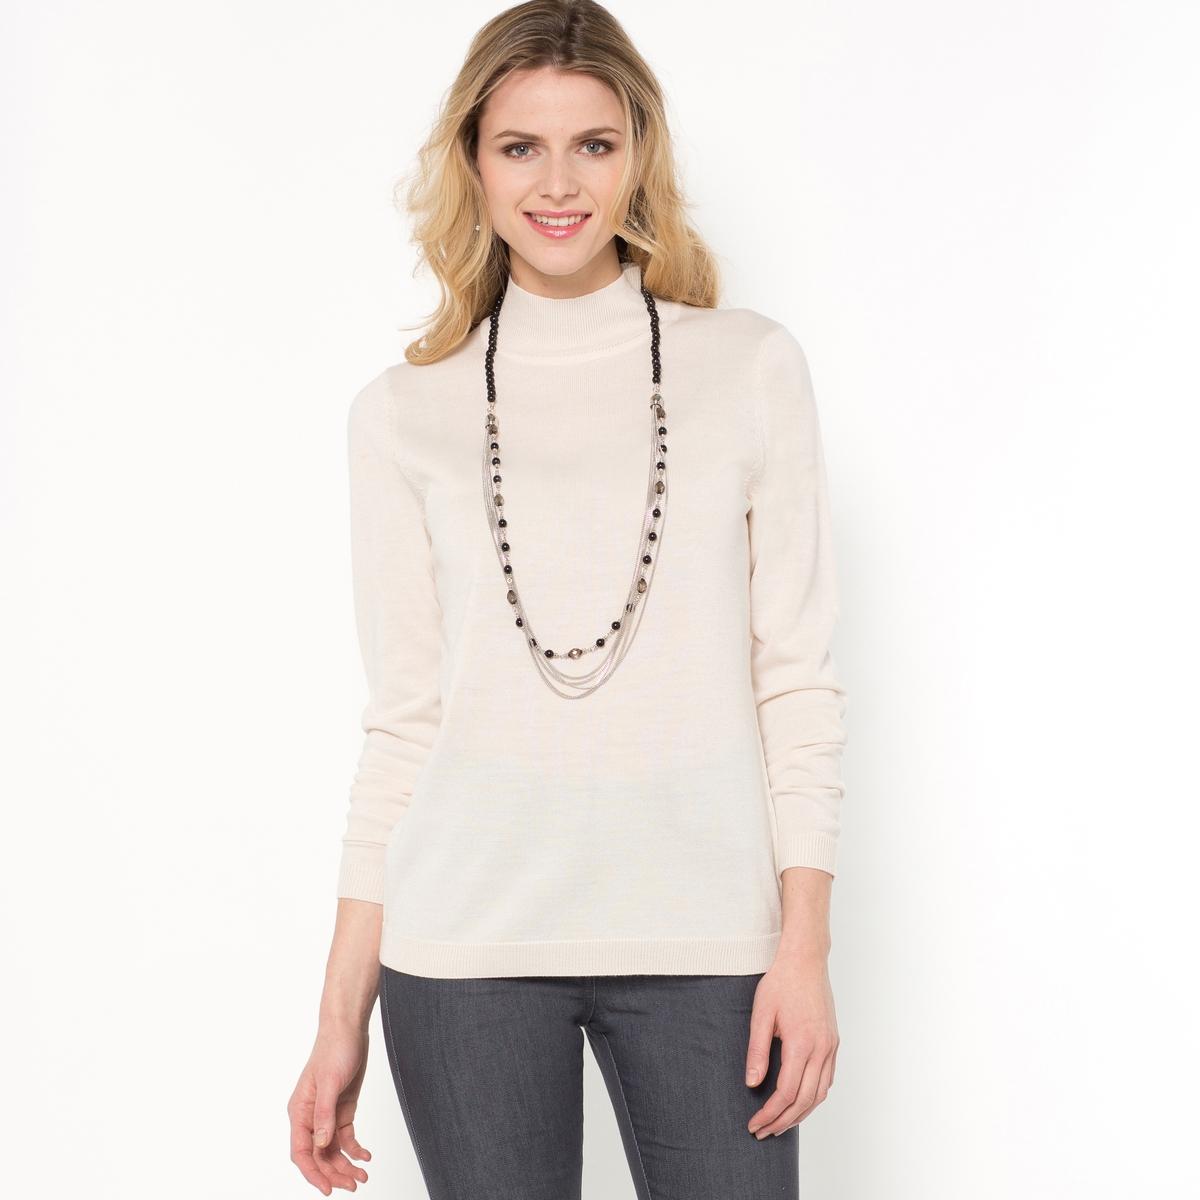 Пуловер со стоячим воротником, 50% шерсти мериноса